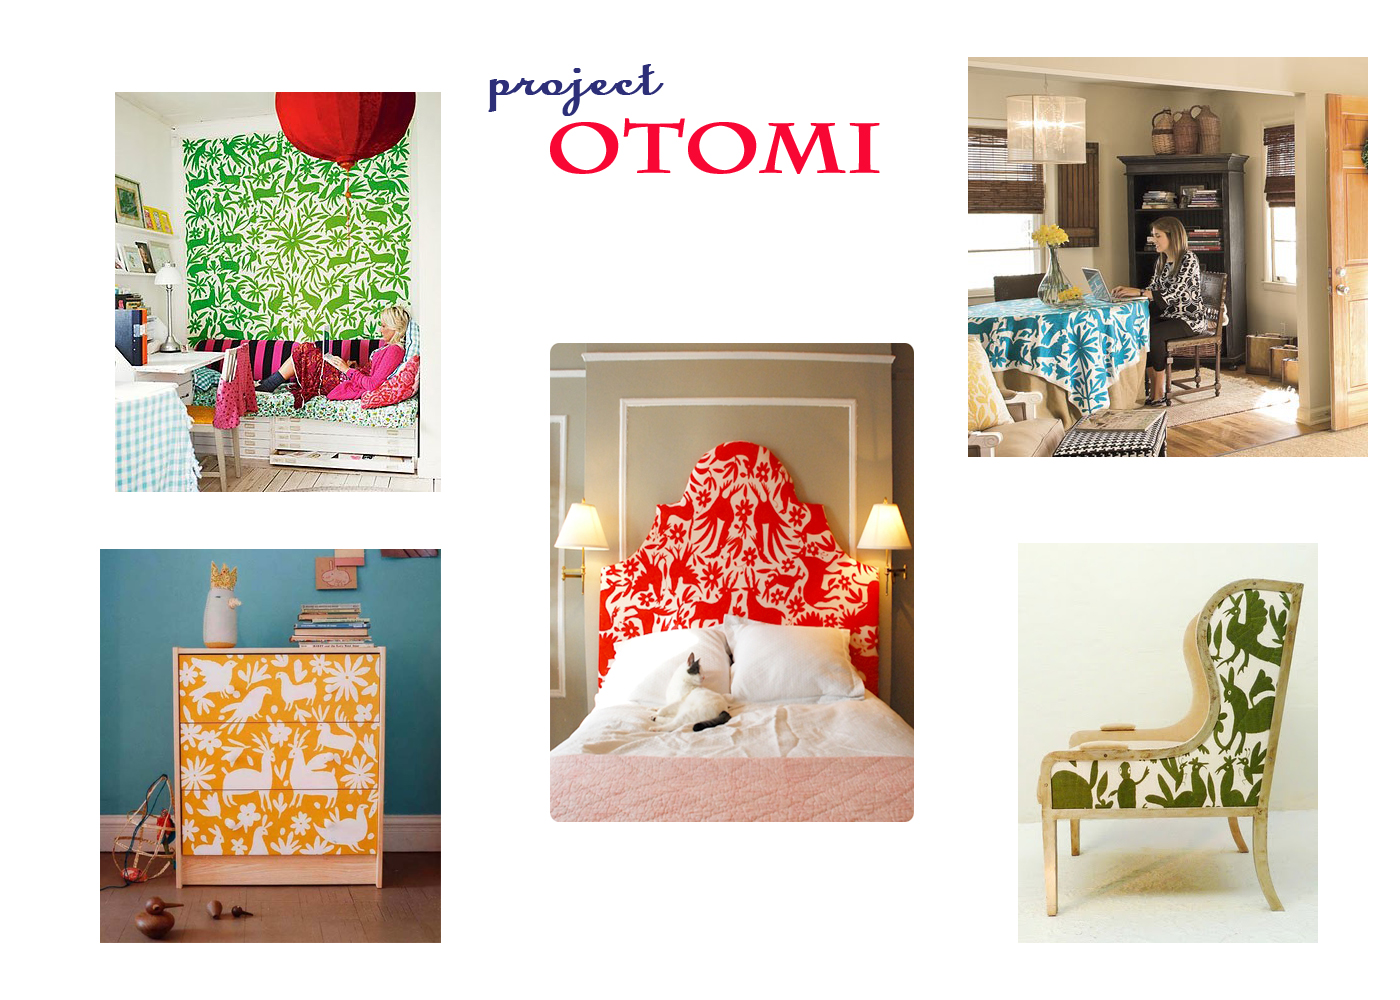 Mexican Home Decor Mexican Otomi Fabric Textiles Allover Designer Pattern Stencil